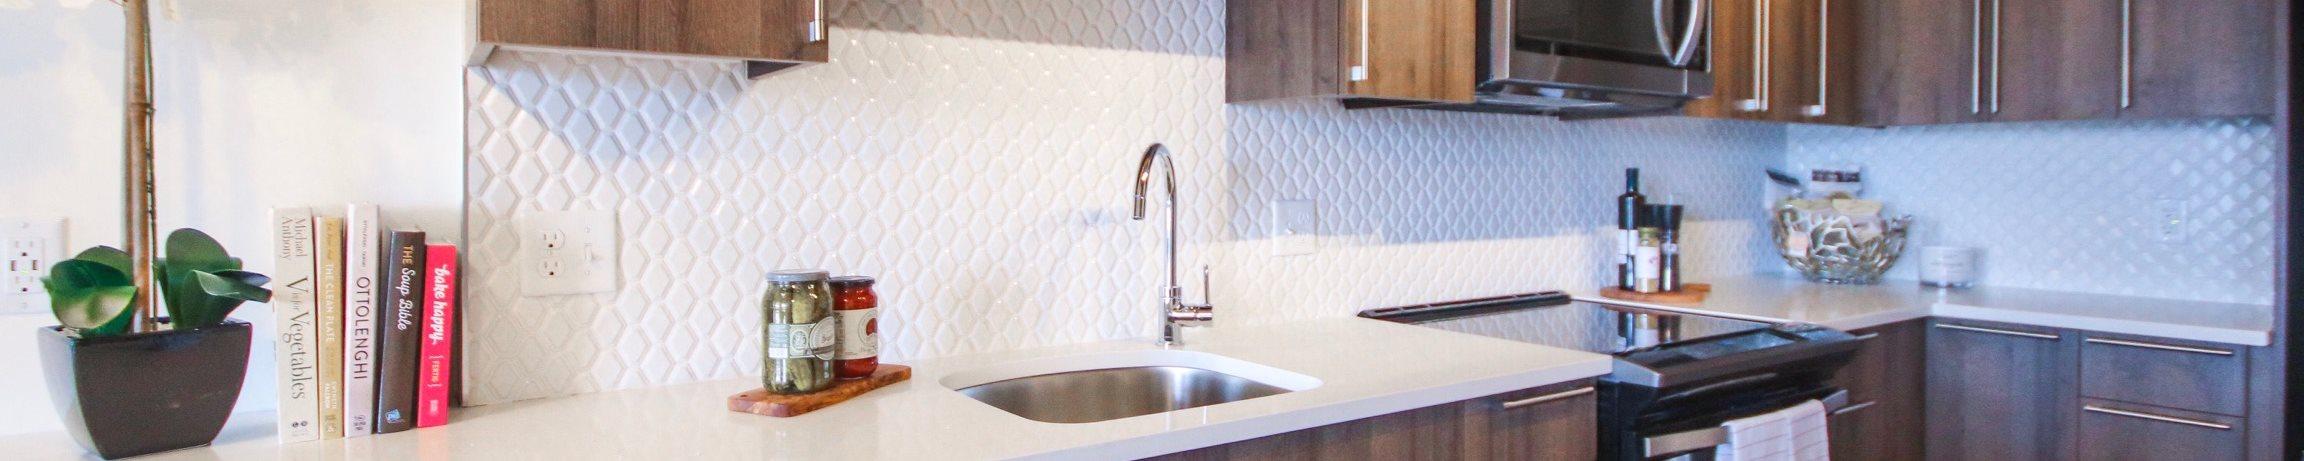 updated kitchen cabinets in Thorndike Exchange apartments